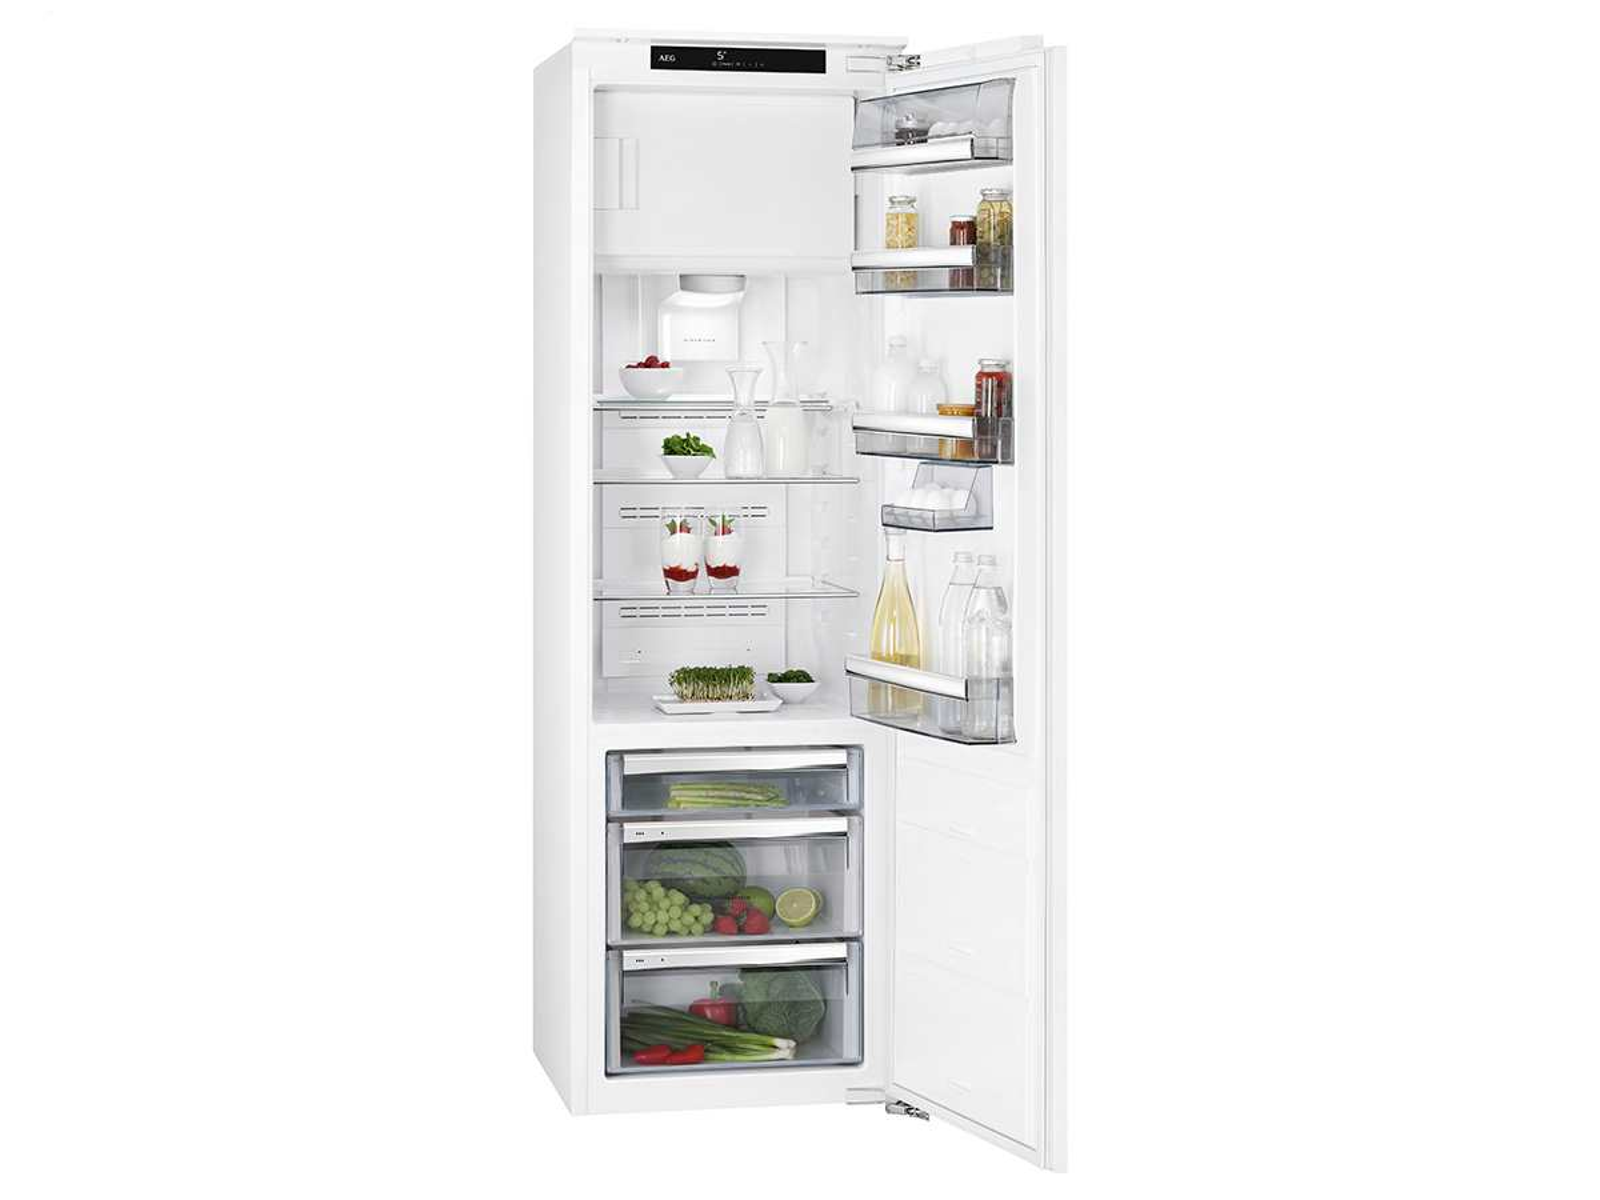 Aeg Kühlschrank Einbau : Aeg sfe zc einbaukühlschrank